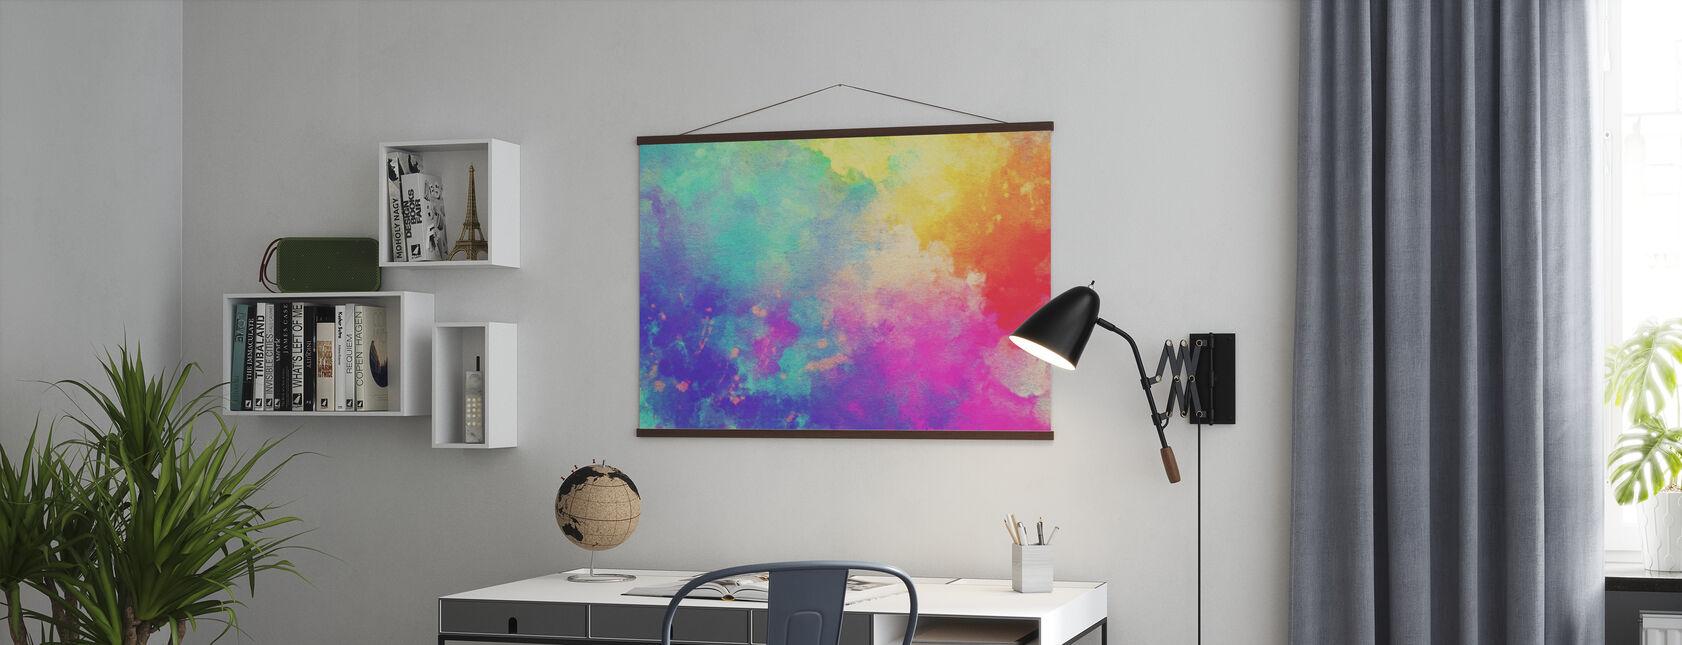 Aquarell Texturierter Hintergrund - Poster - Büro